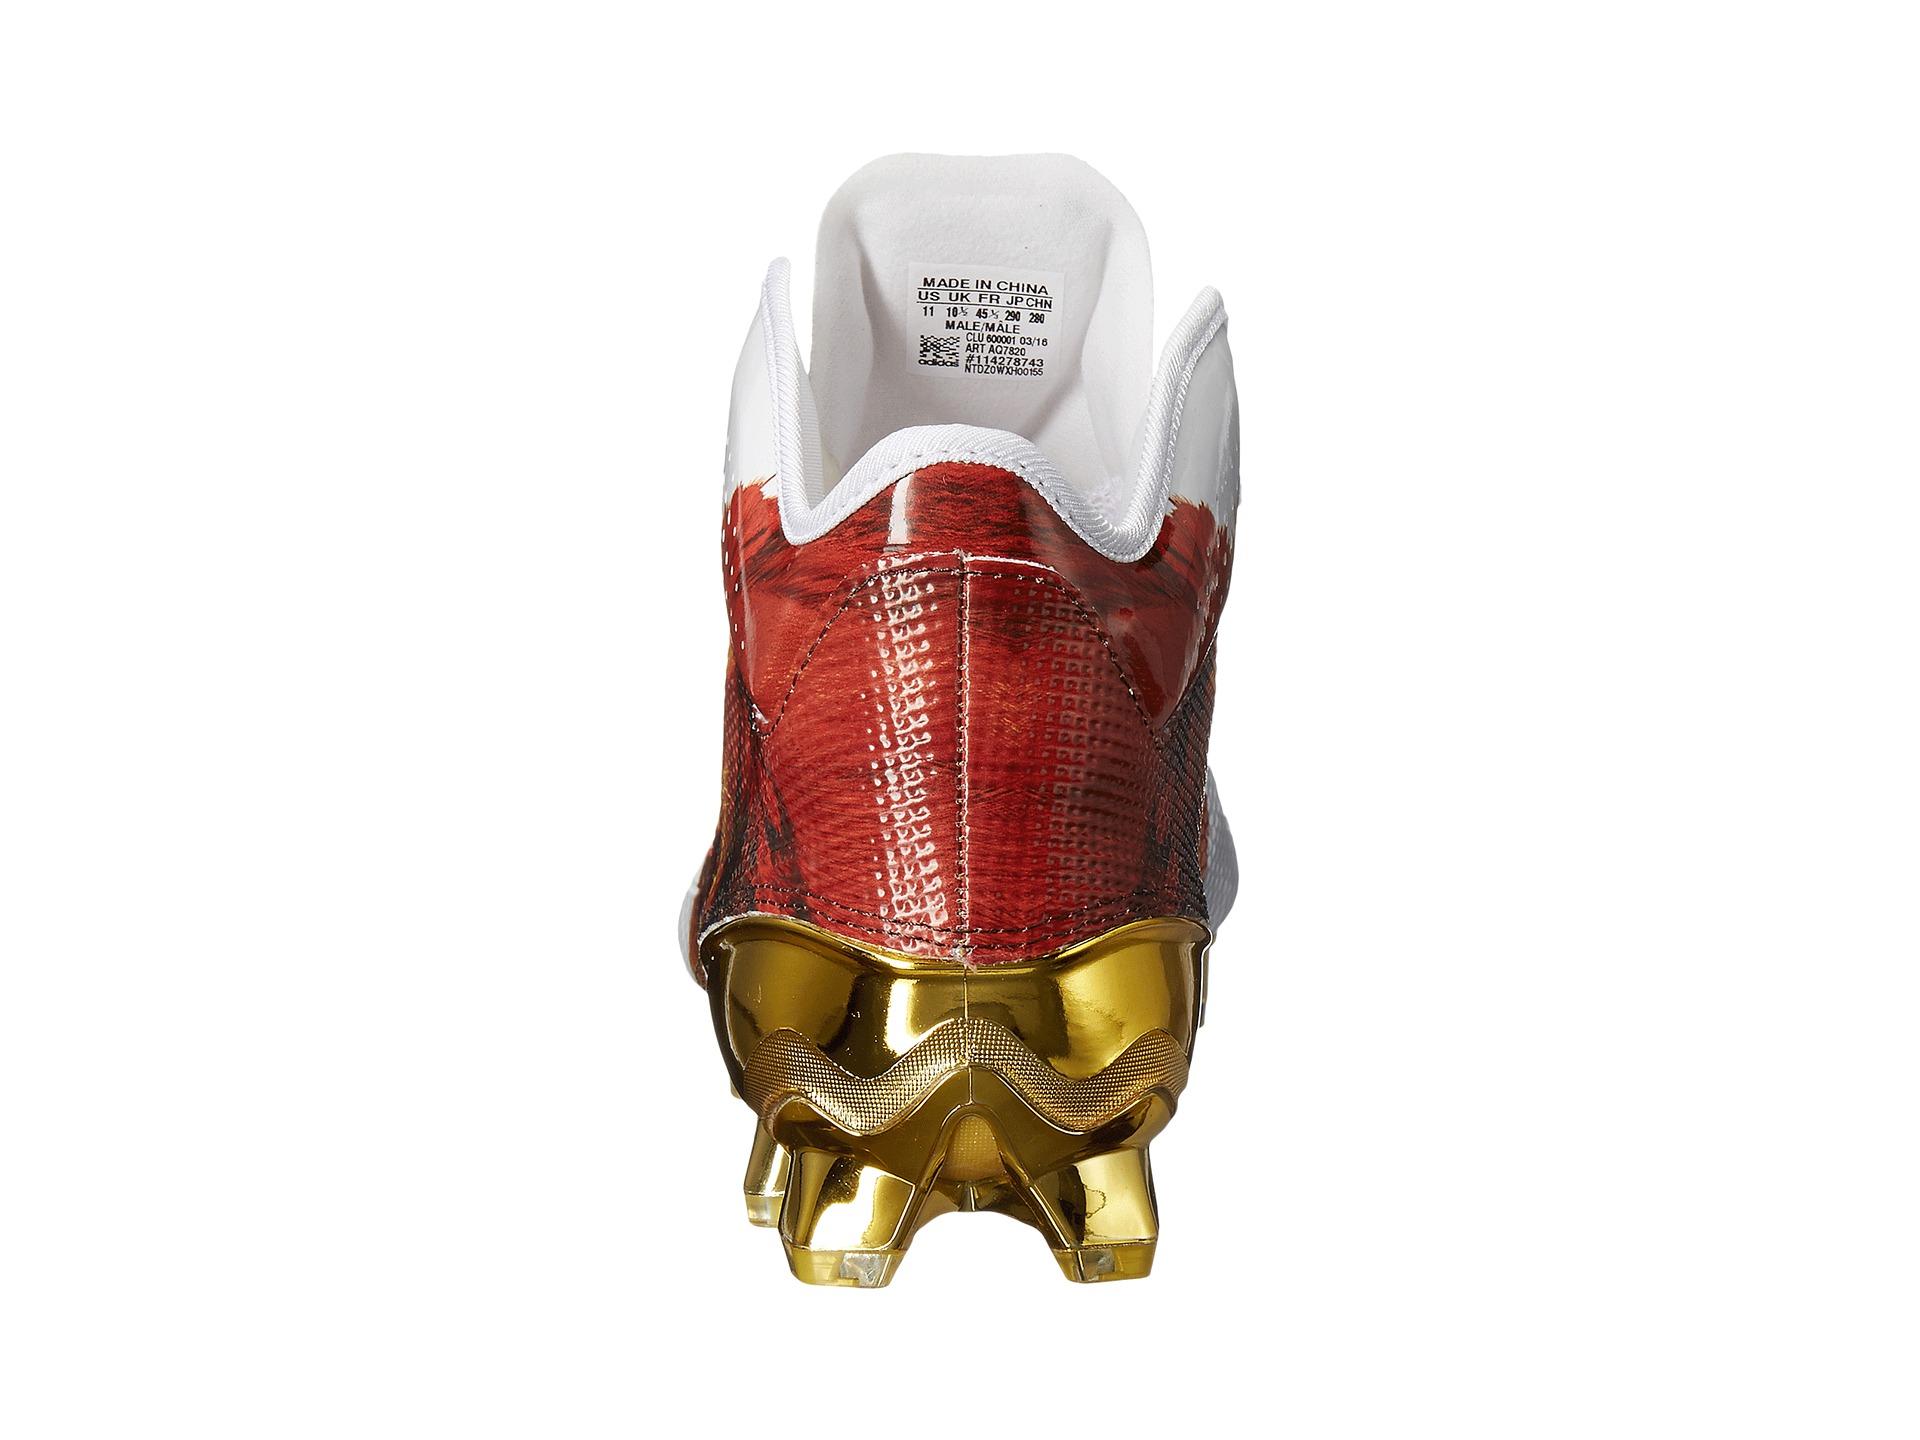 adidas Adizero 5-Star 5.0 Mid Uncaged at 6pm.com